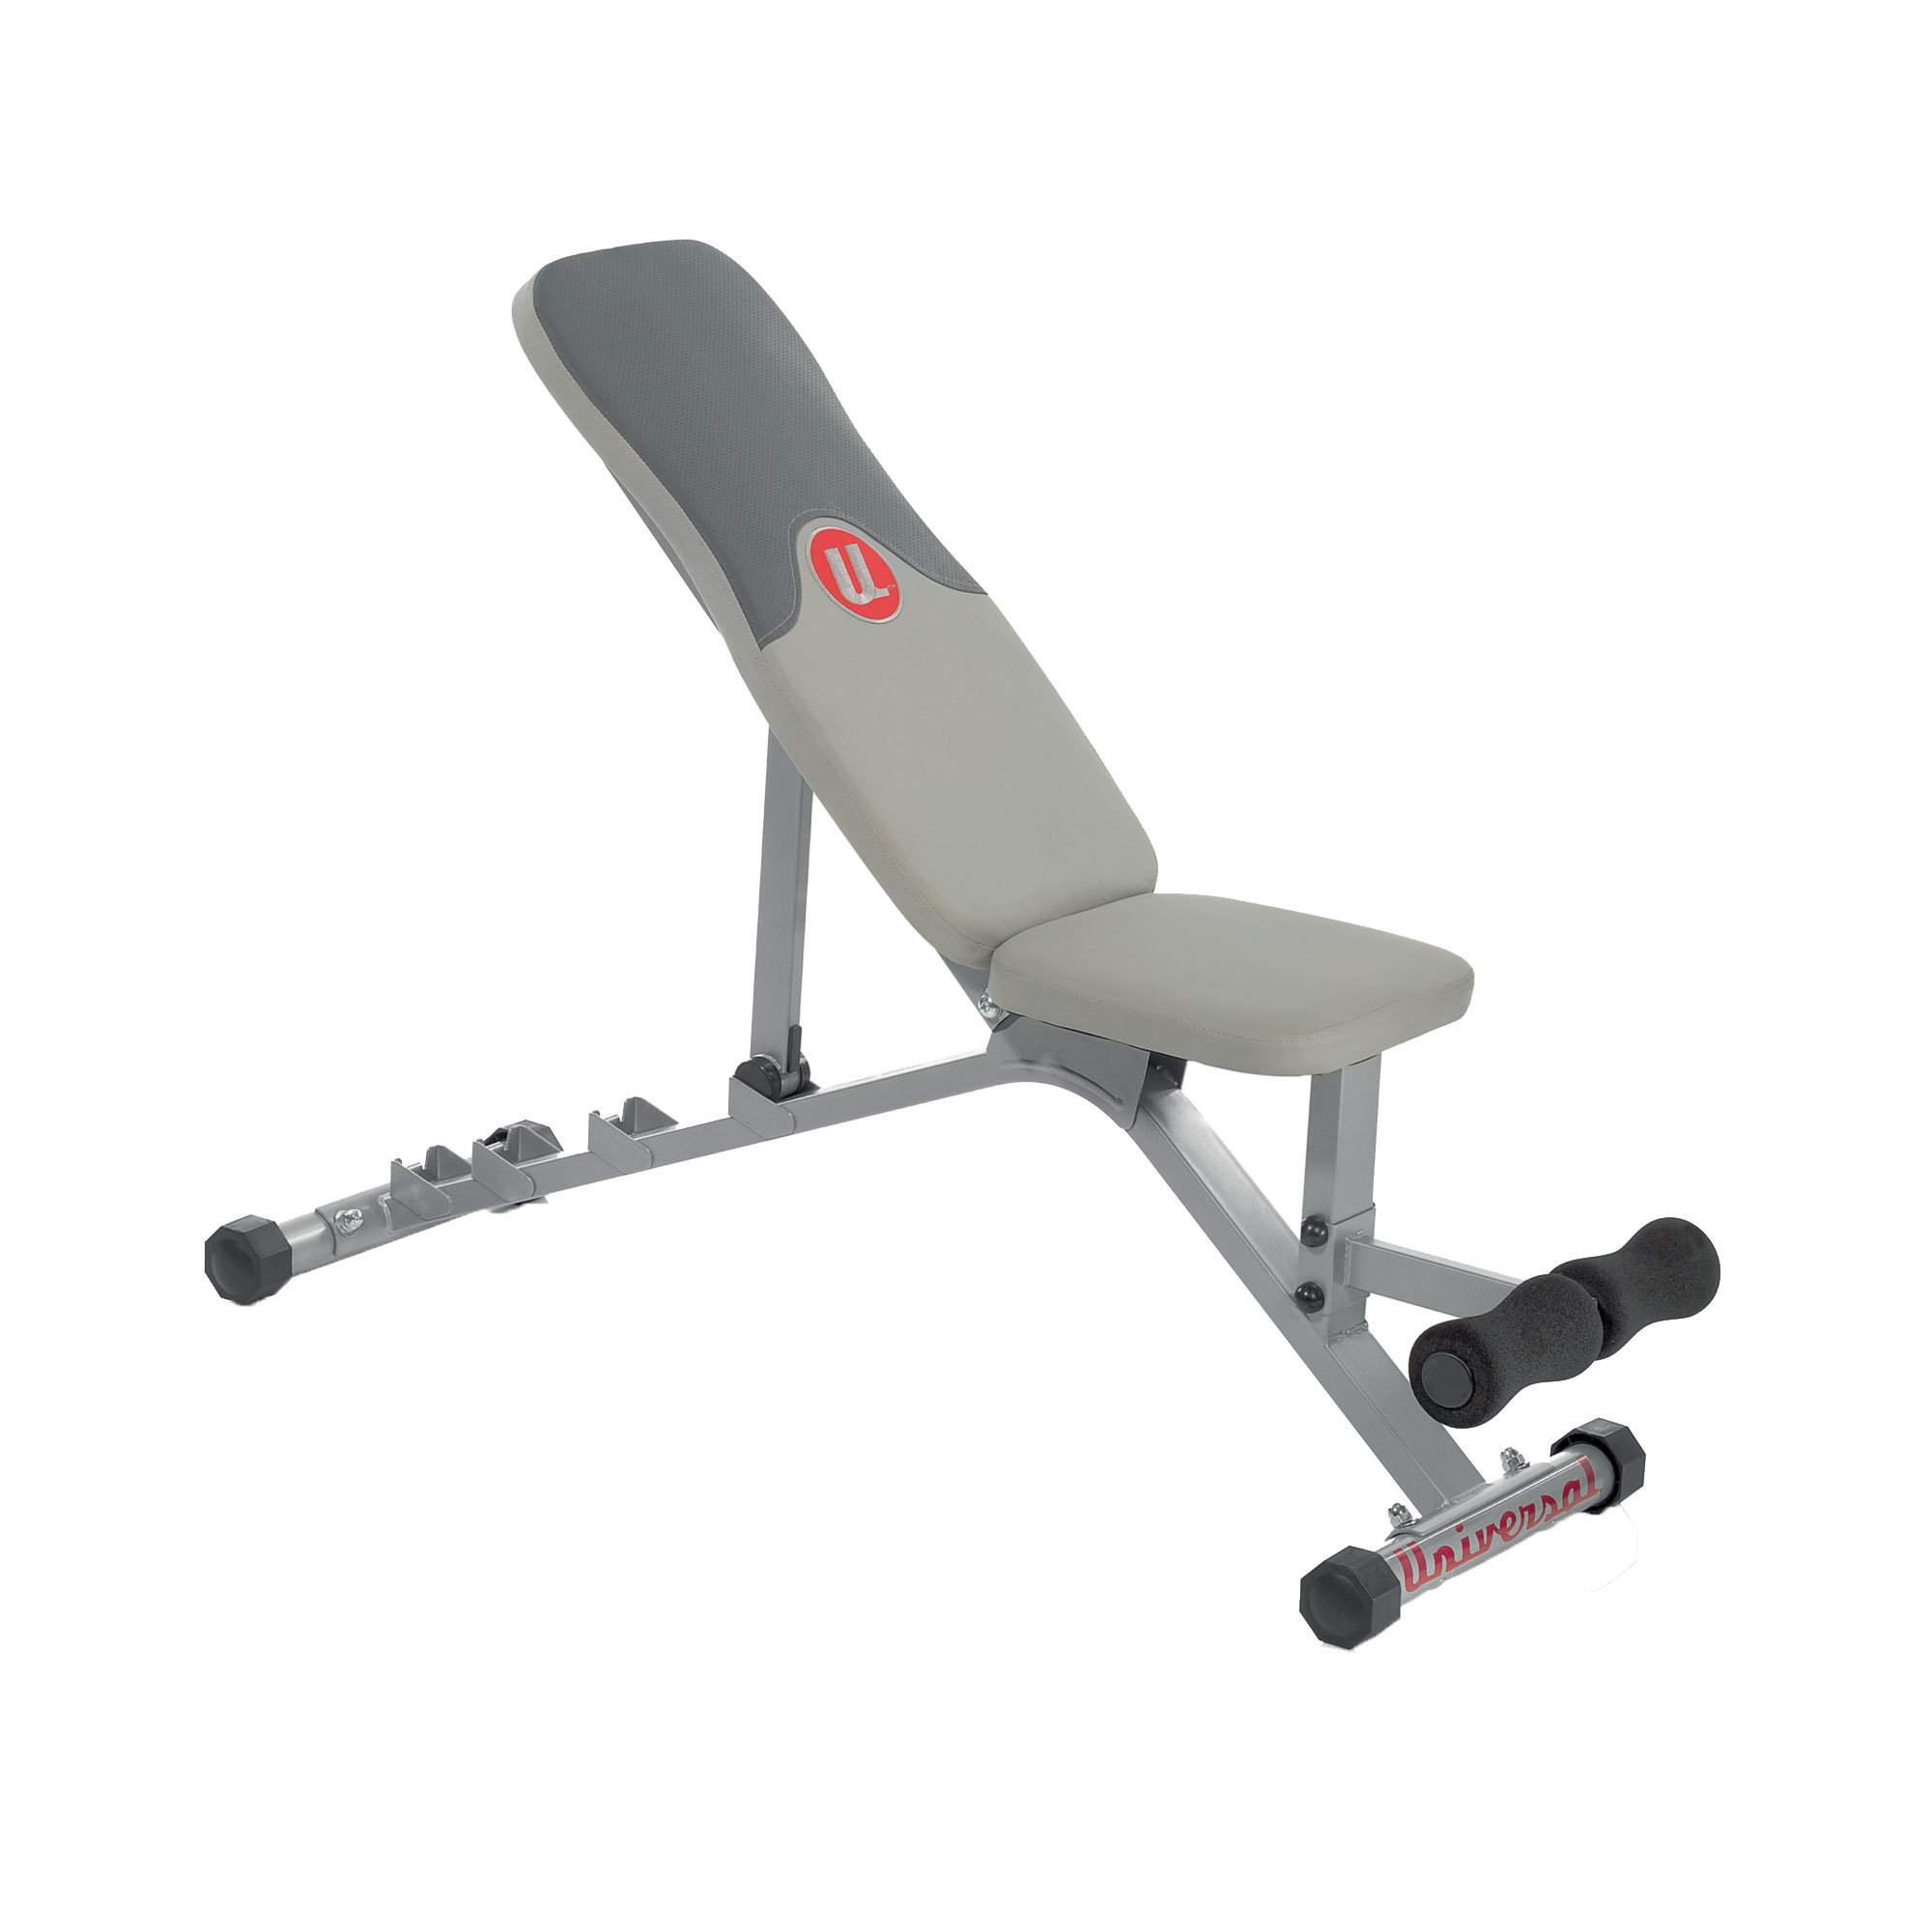 Universal UB300 Adjustable Bench with Five-Position Settings